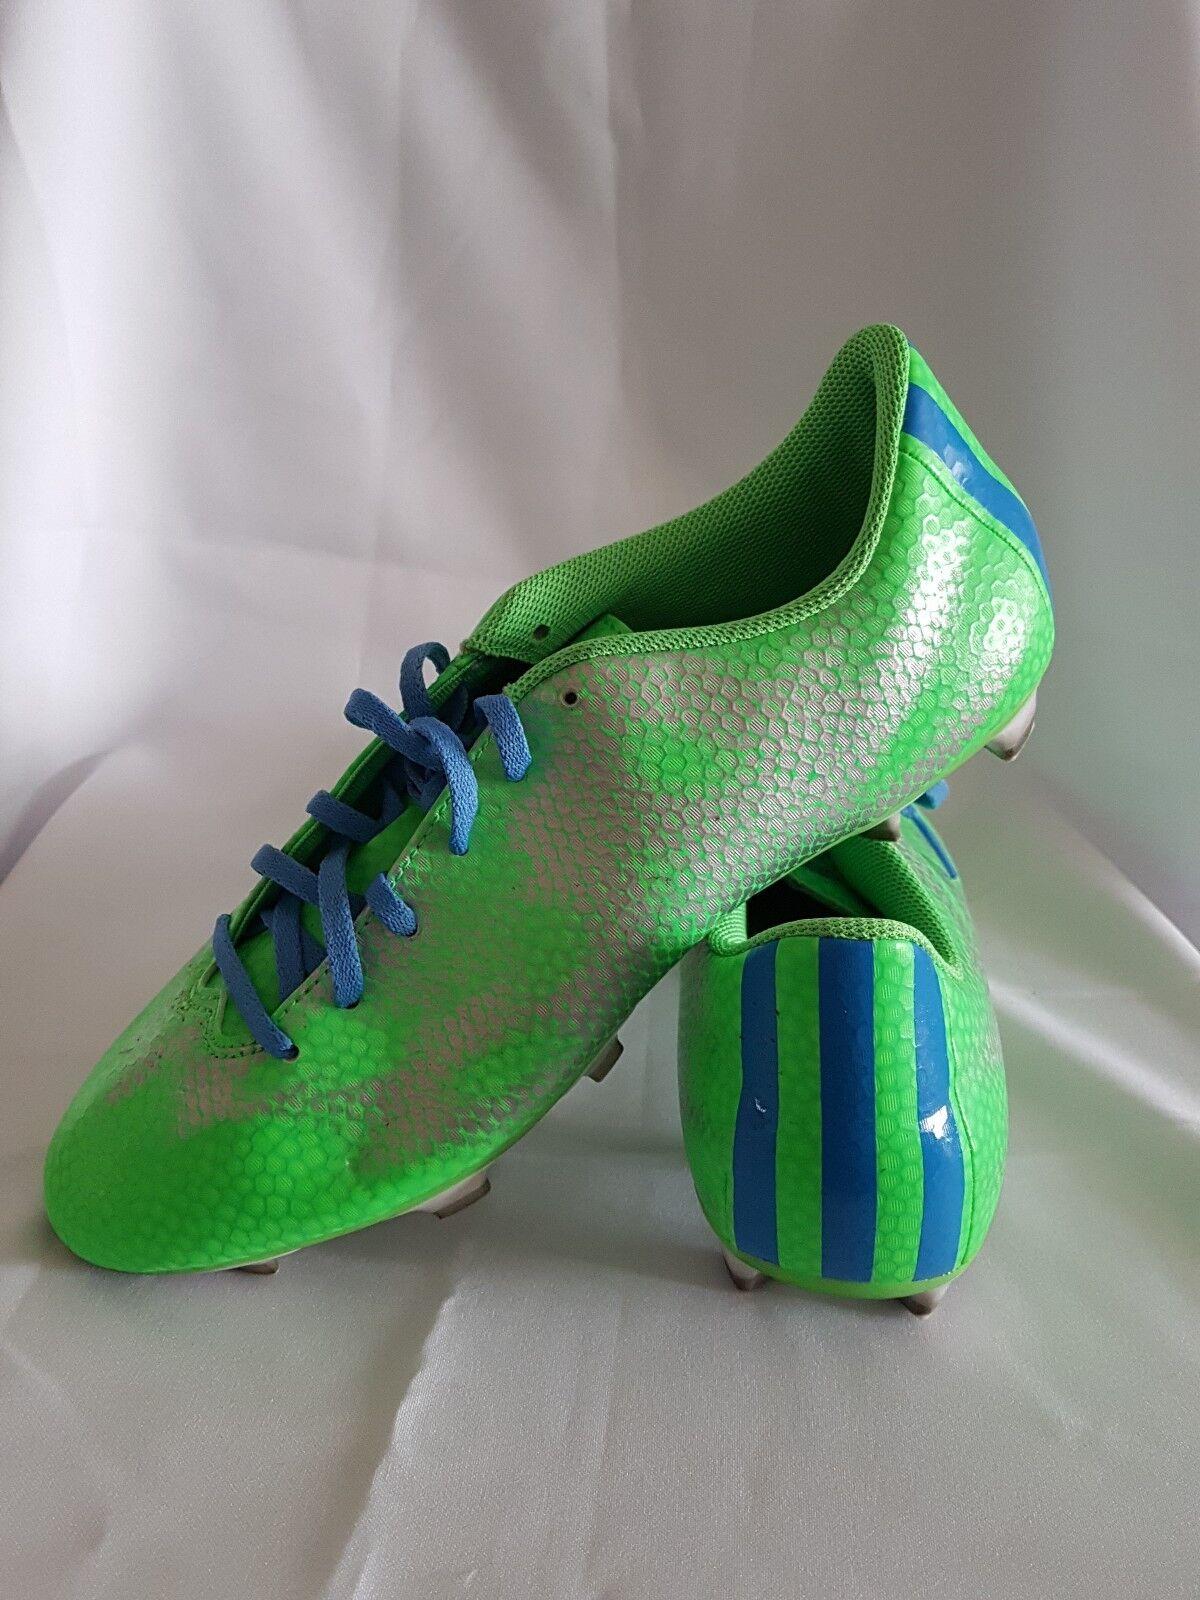 6fb6d12c6 Flash Green Lucky Blue Silver Metallic adidas F 5 FG - - - Women s ...